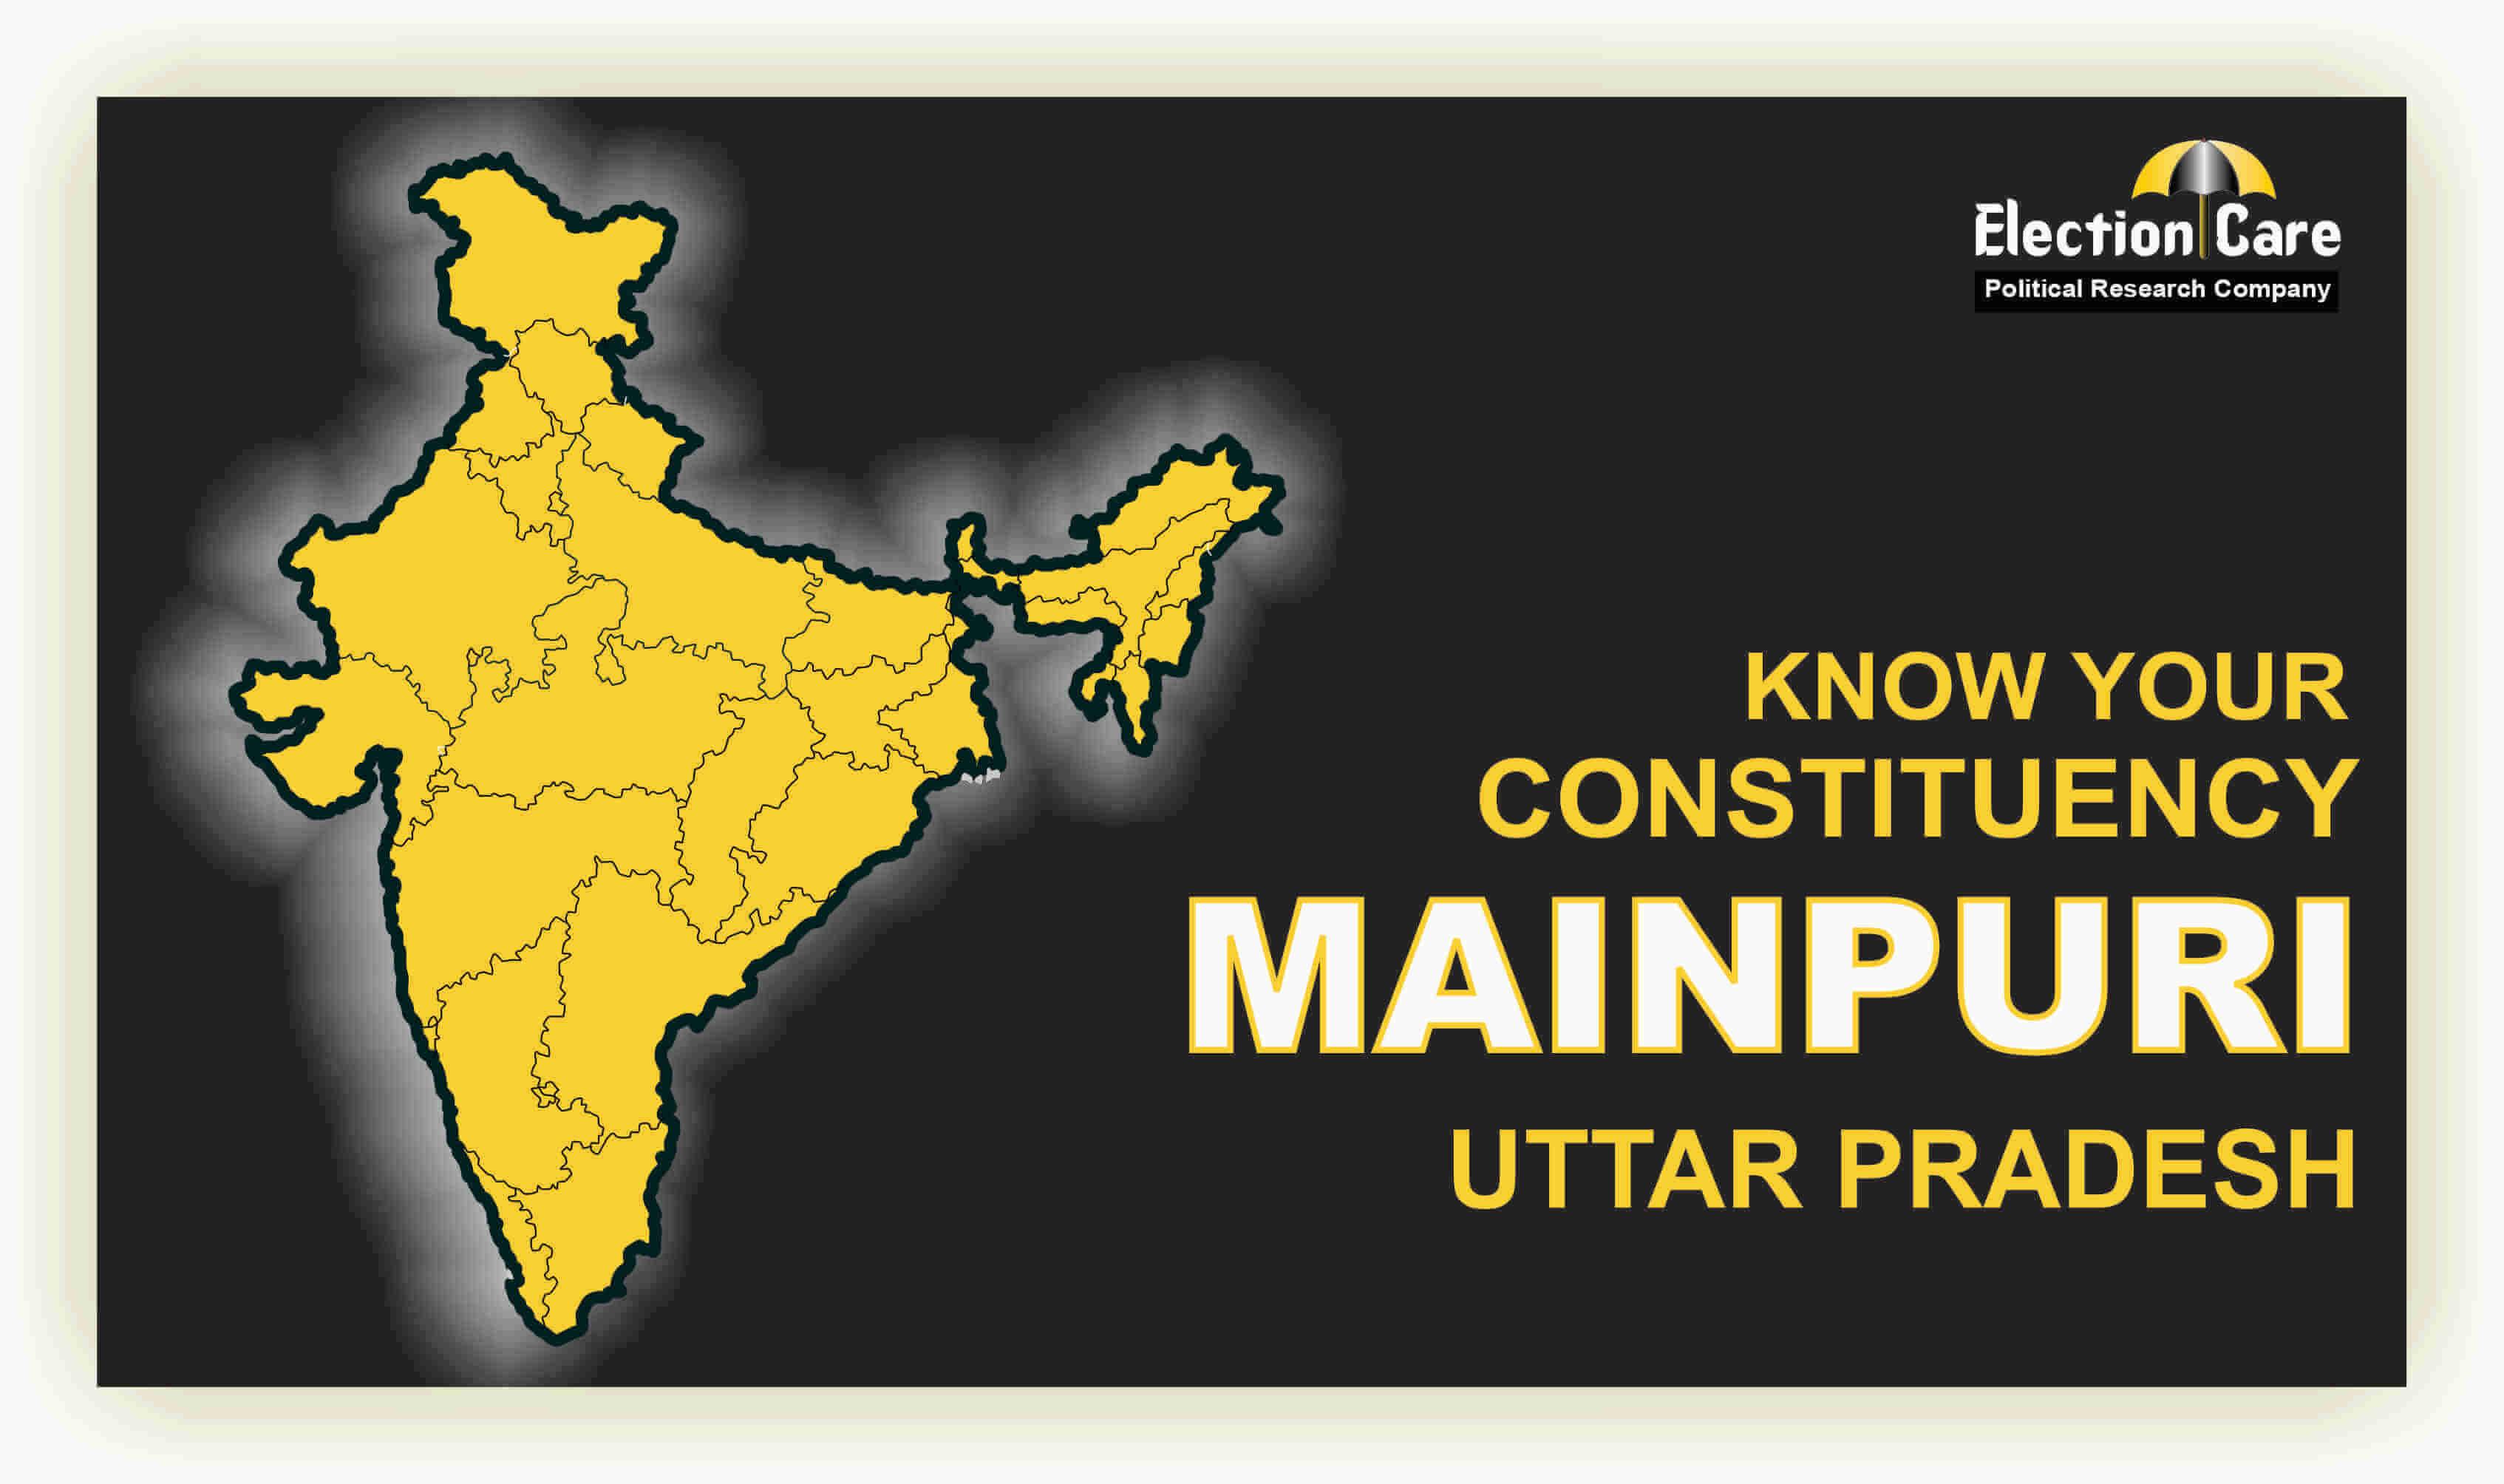 Mainpuri Parliament Election Result